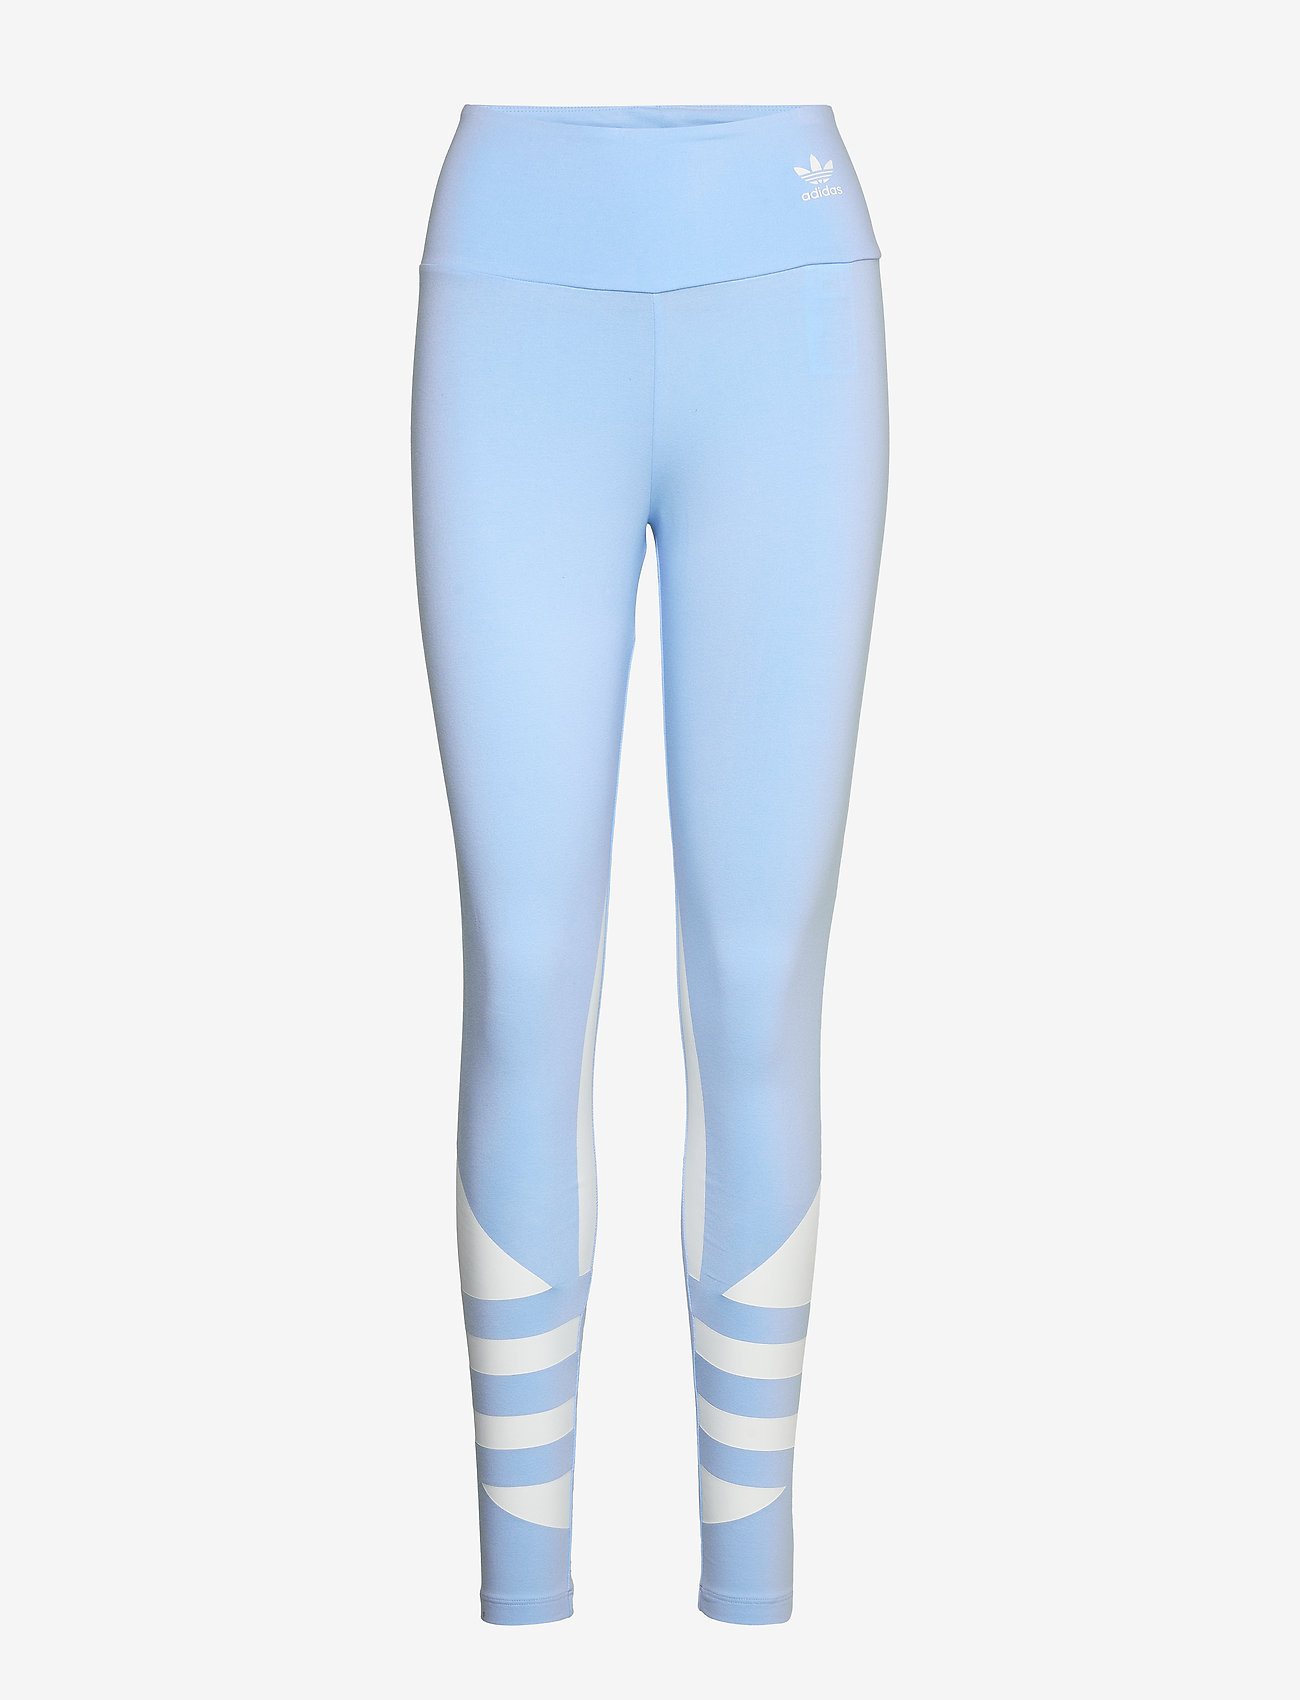 adidas Originals - LRG LOGO TIGHT - running & training tights - clesky/white - 1